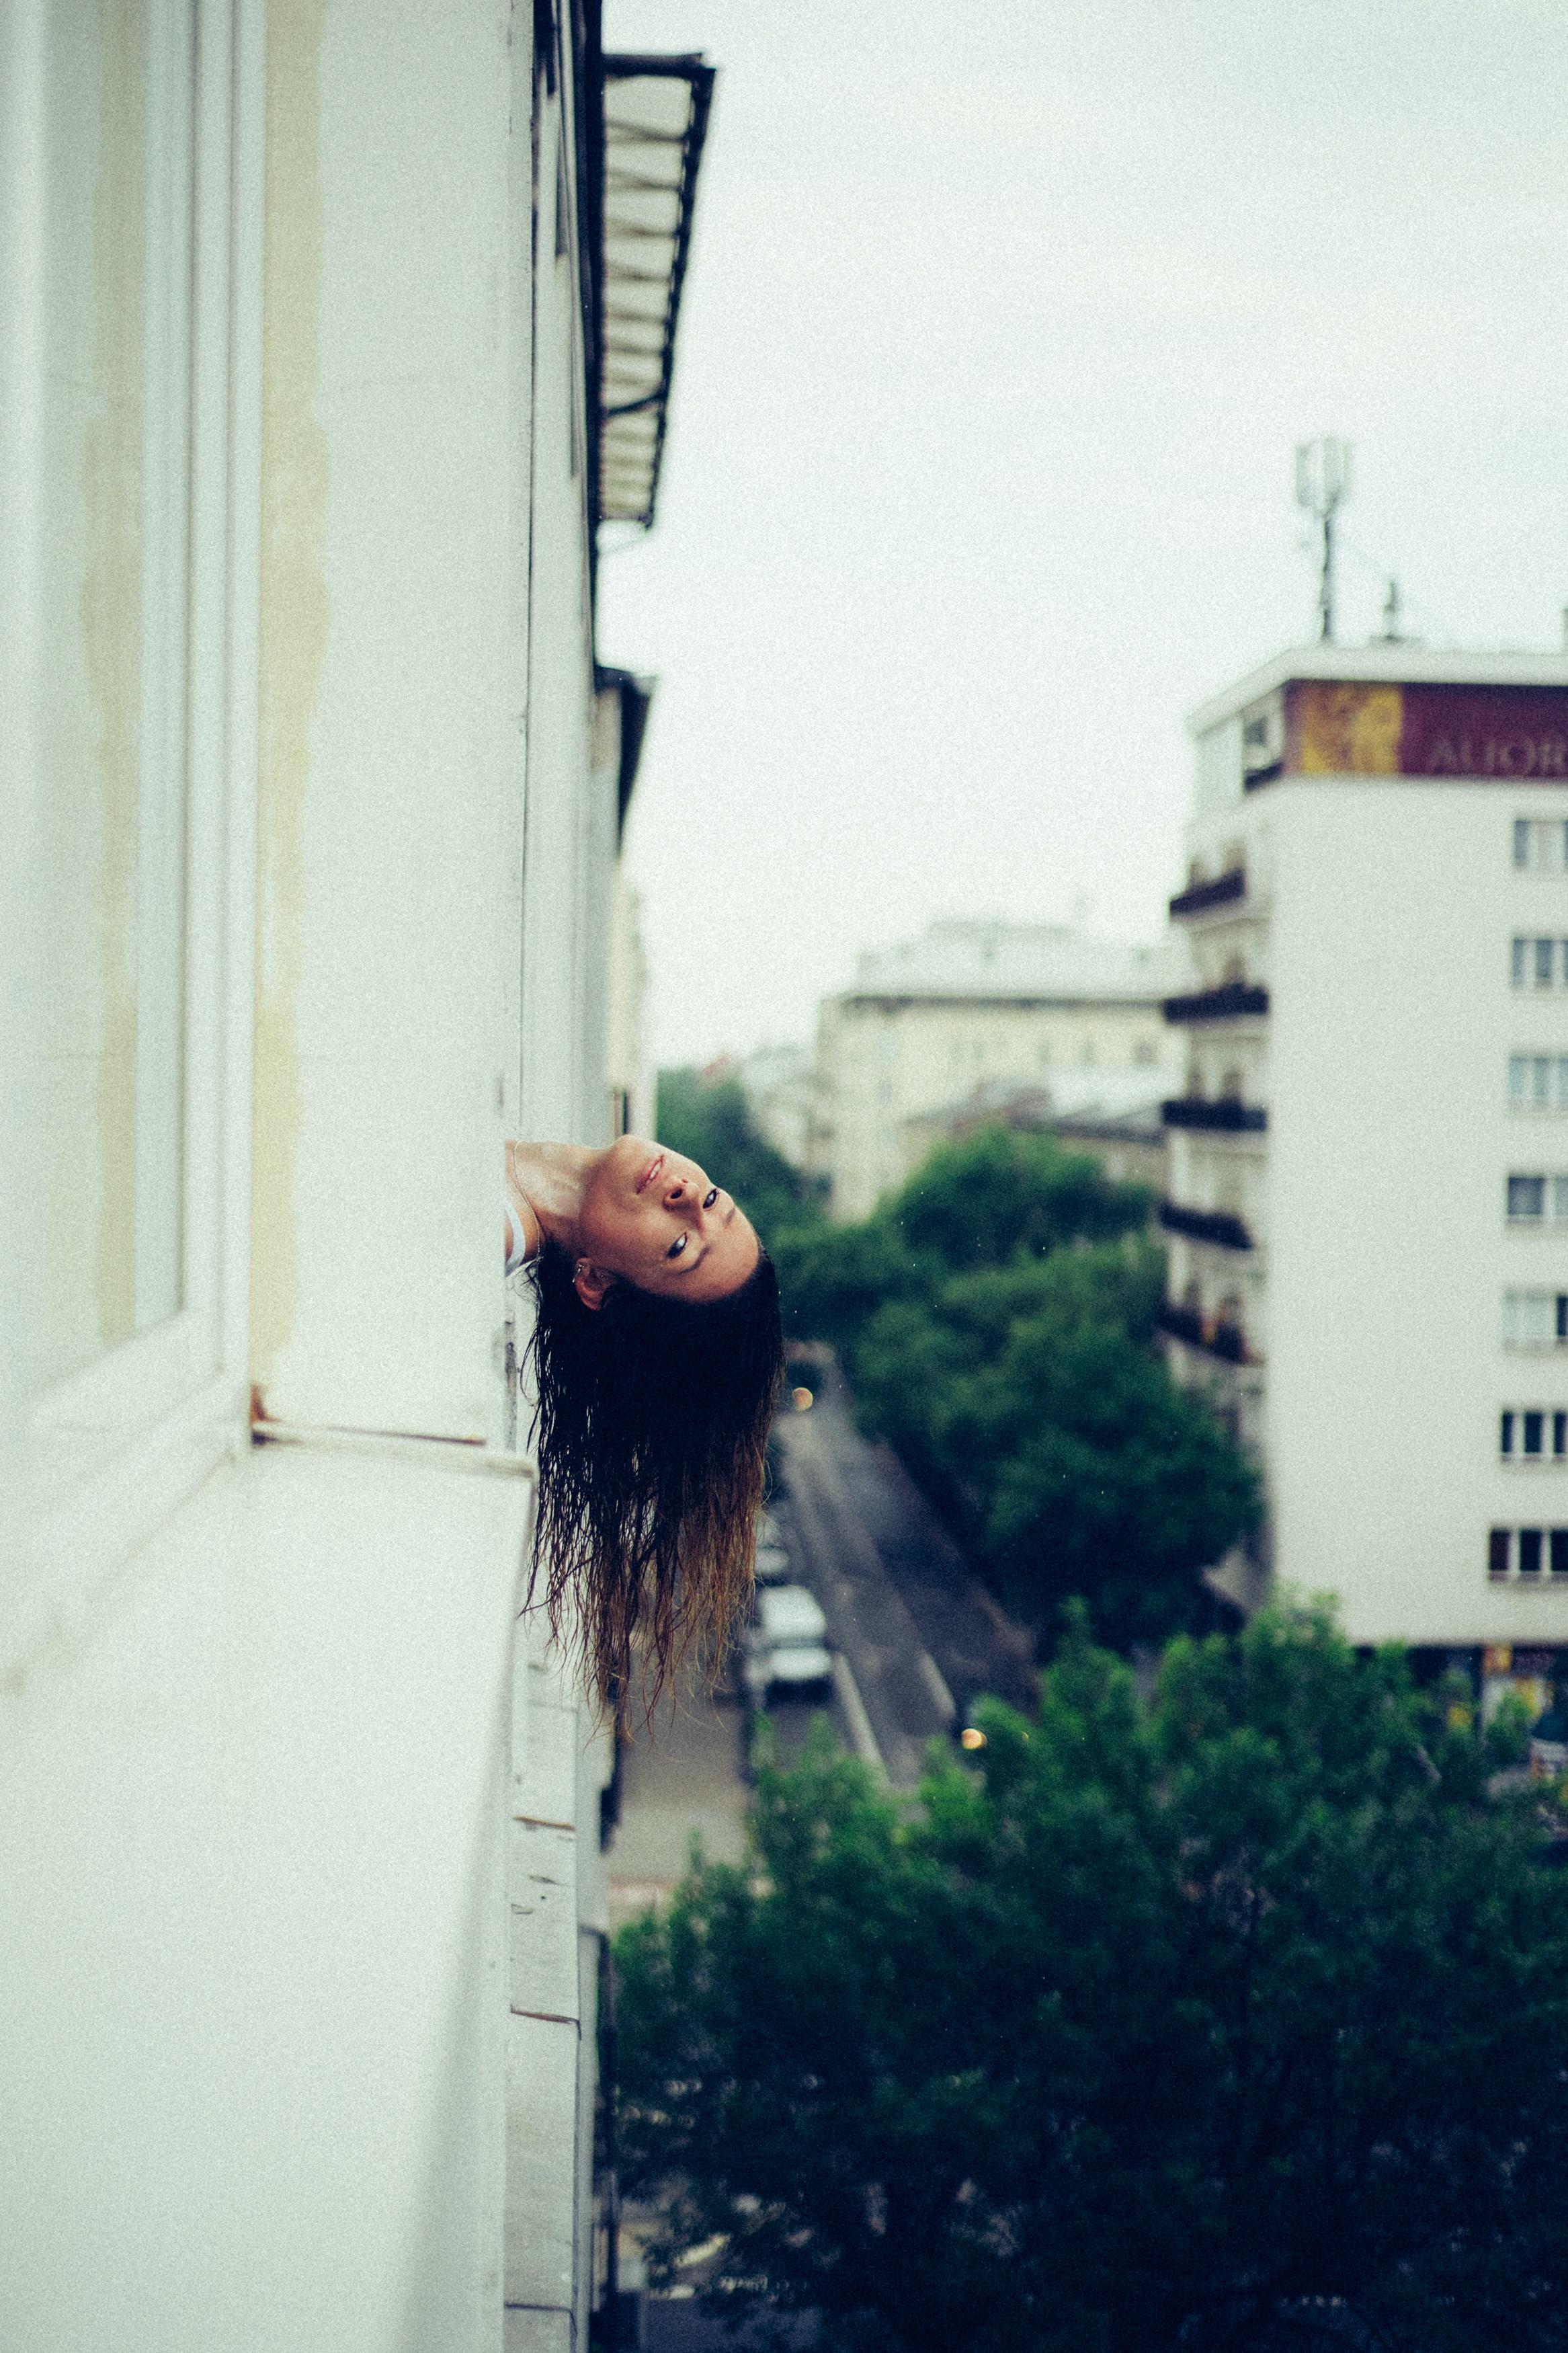 woman with hear head outside the window